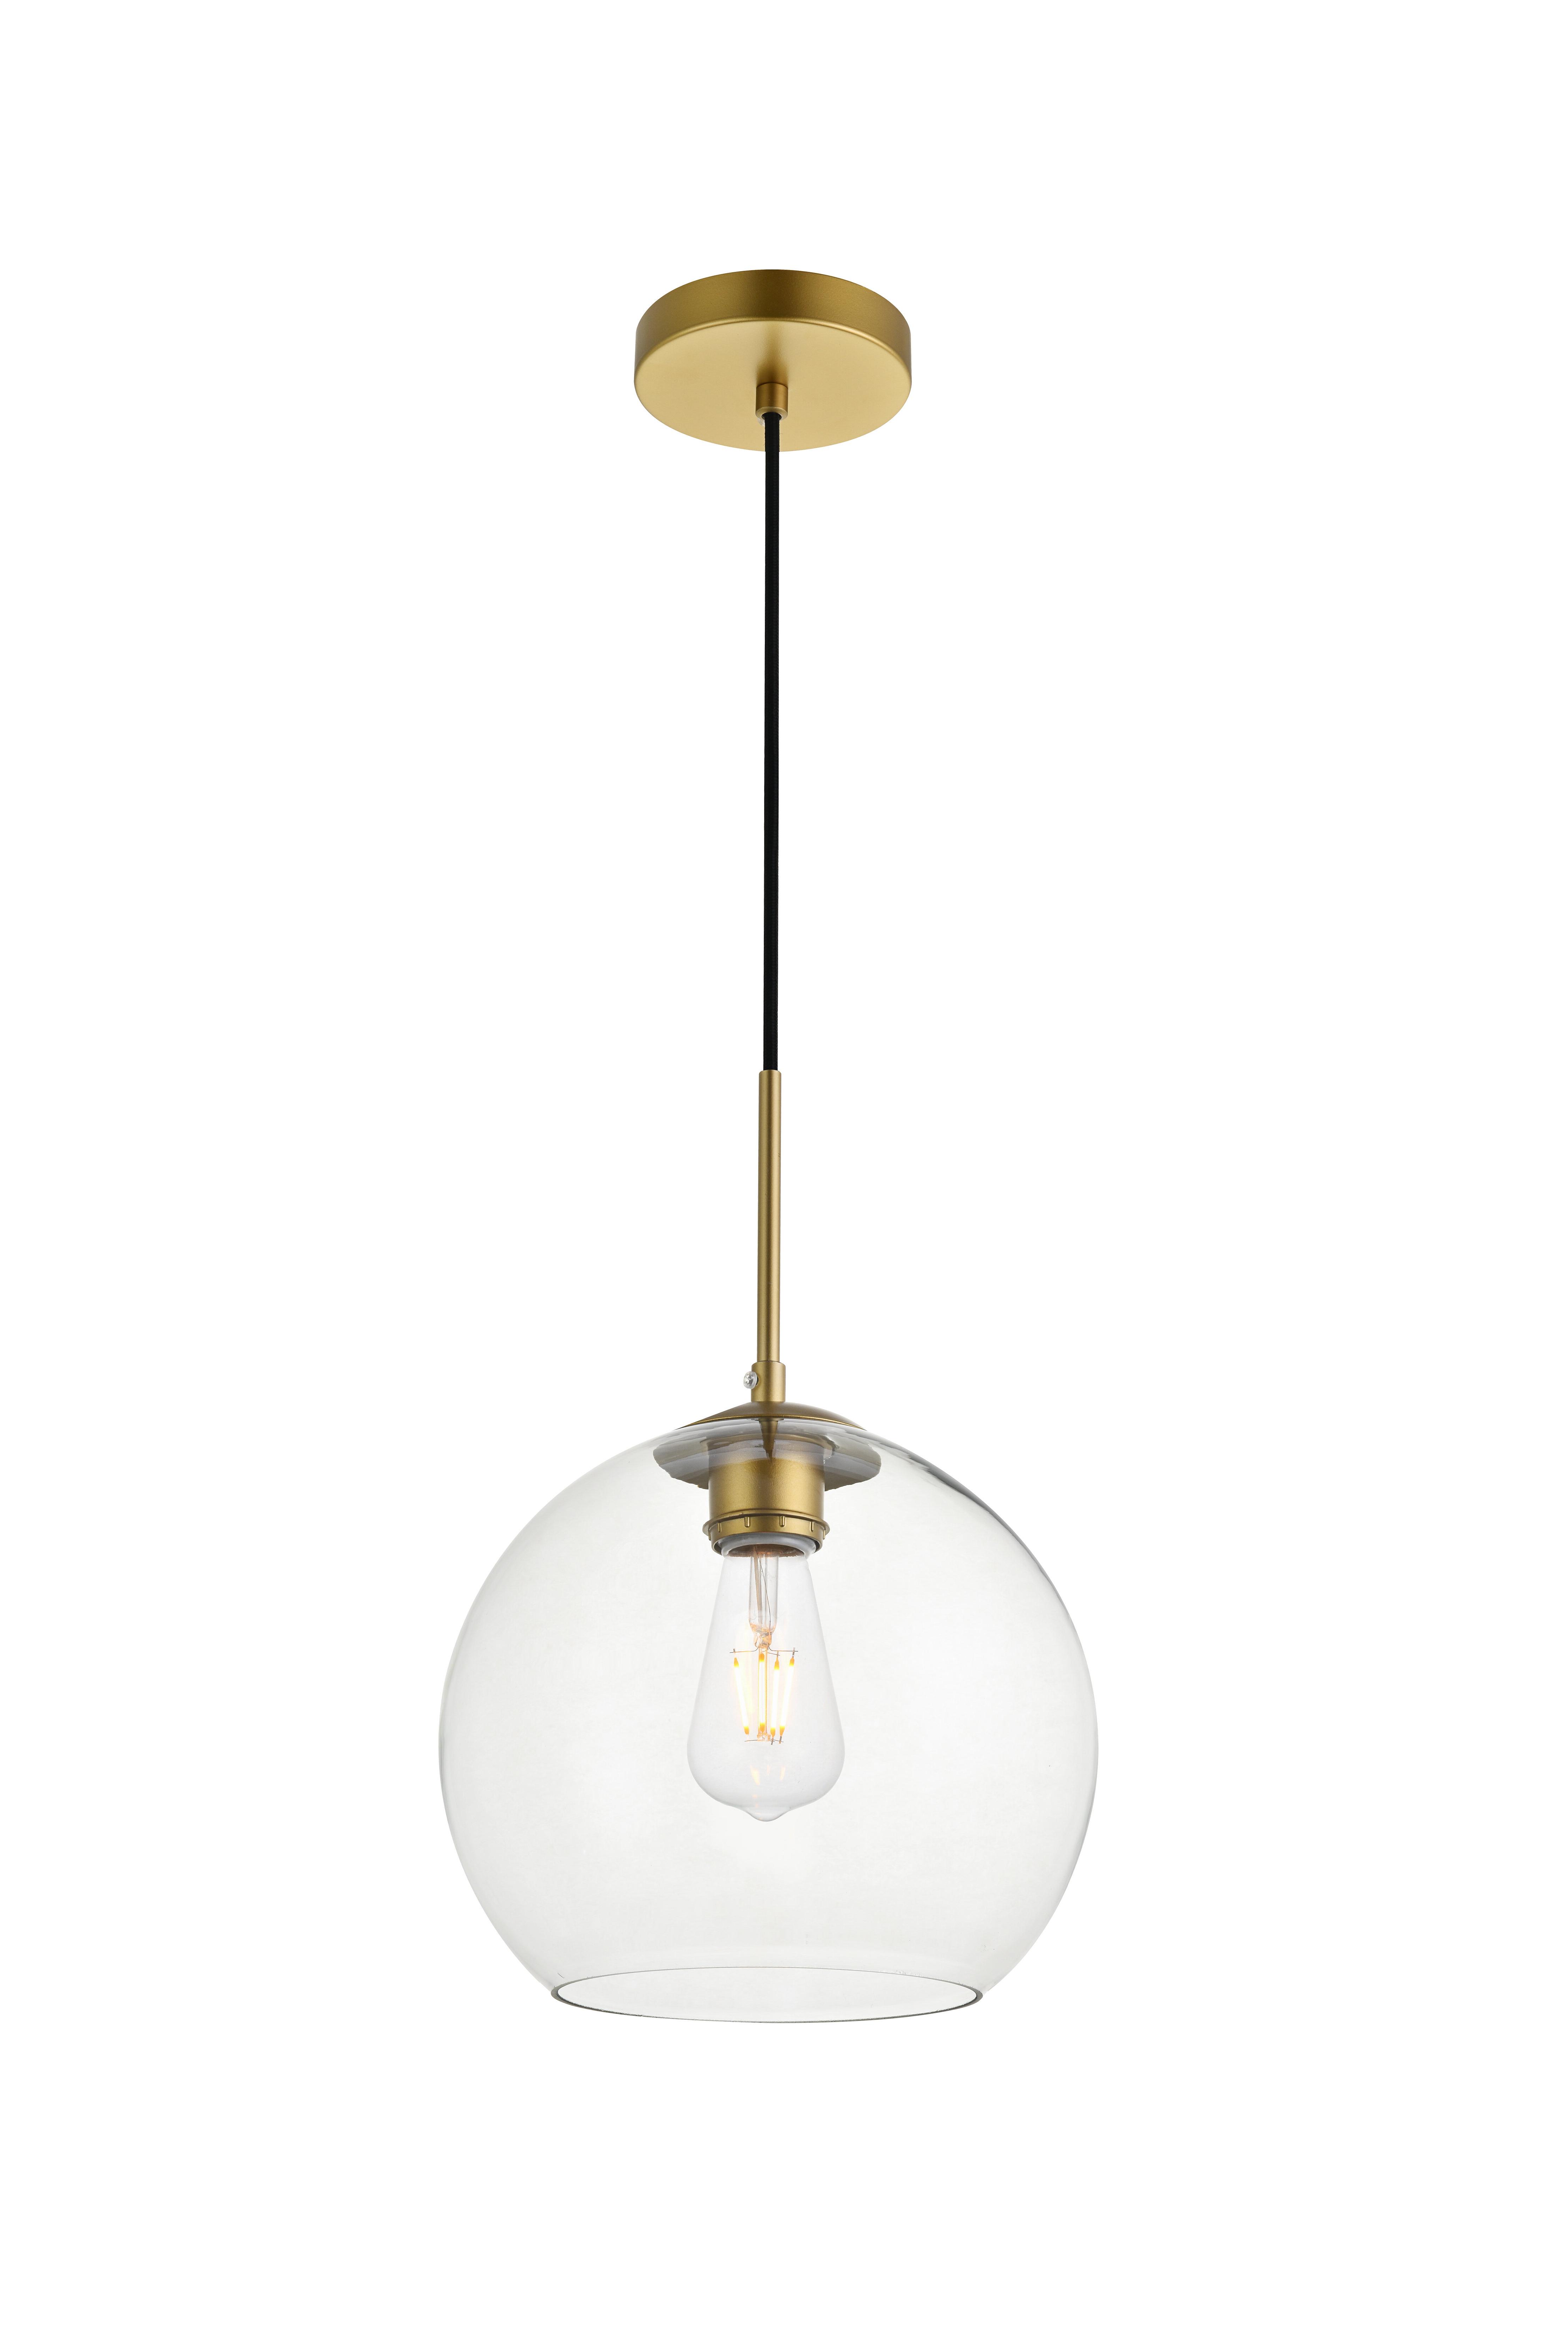 Yearwood 1 Light Single Globe Pendant Throughout Well Known Cayden 1 Light Single Globe Pendants (View 20 of 20)